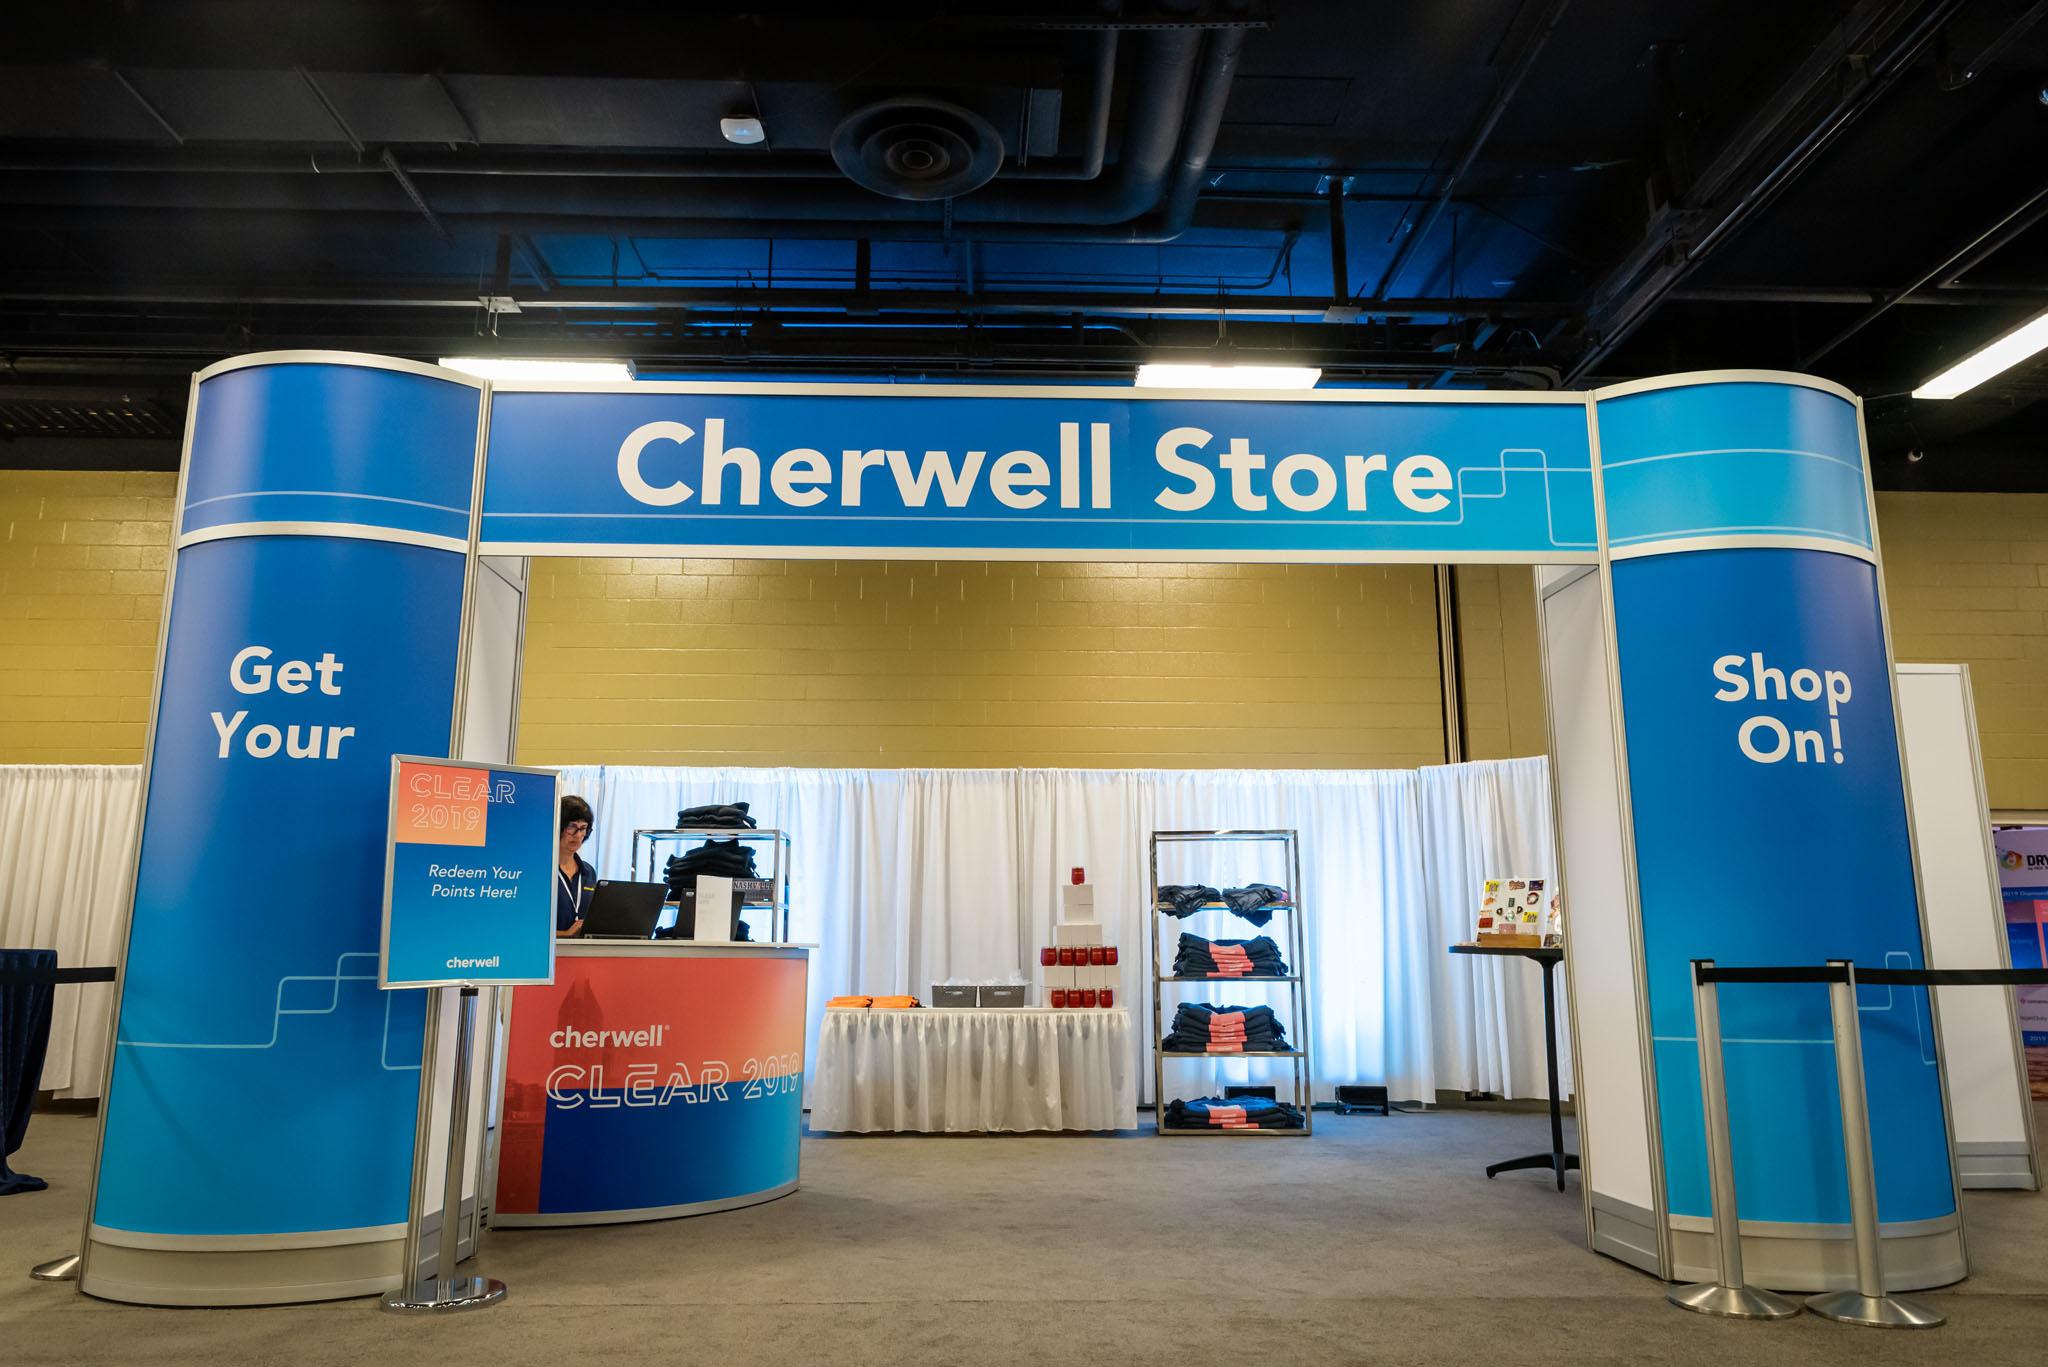 Cherwell_Clear_2019_278.jpg